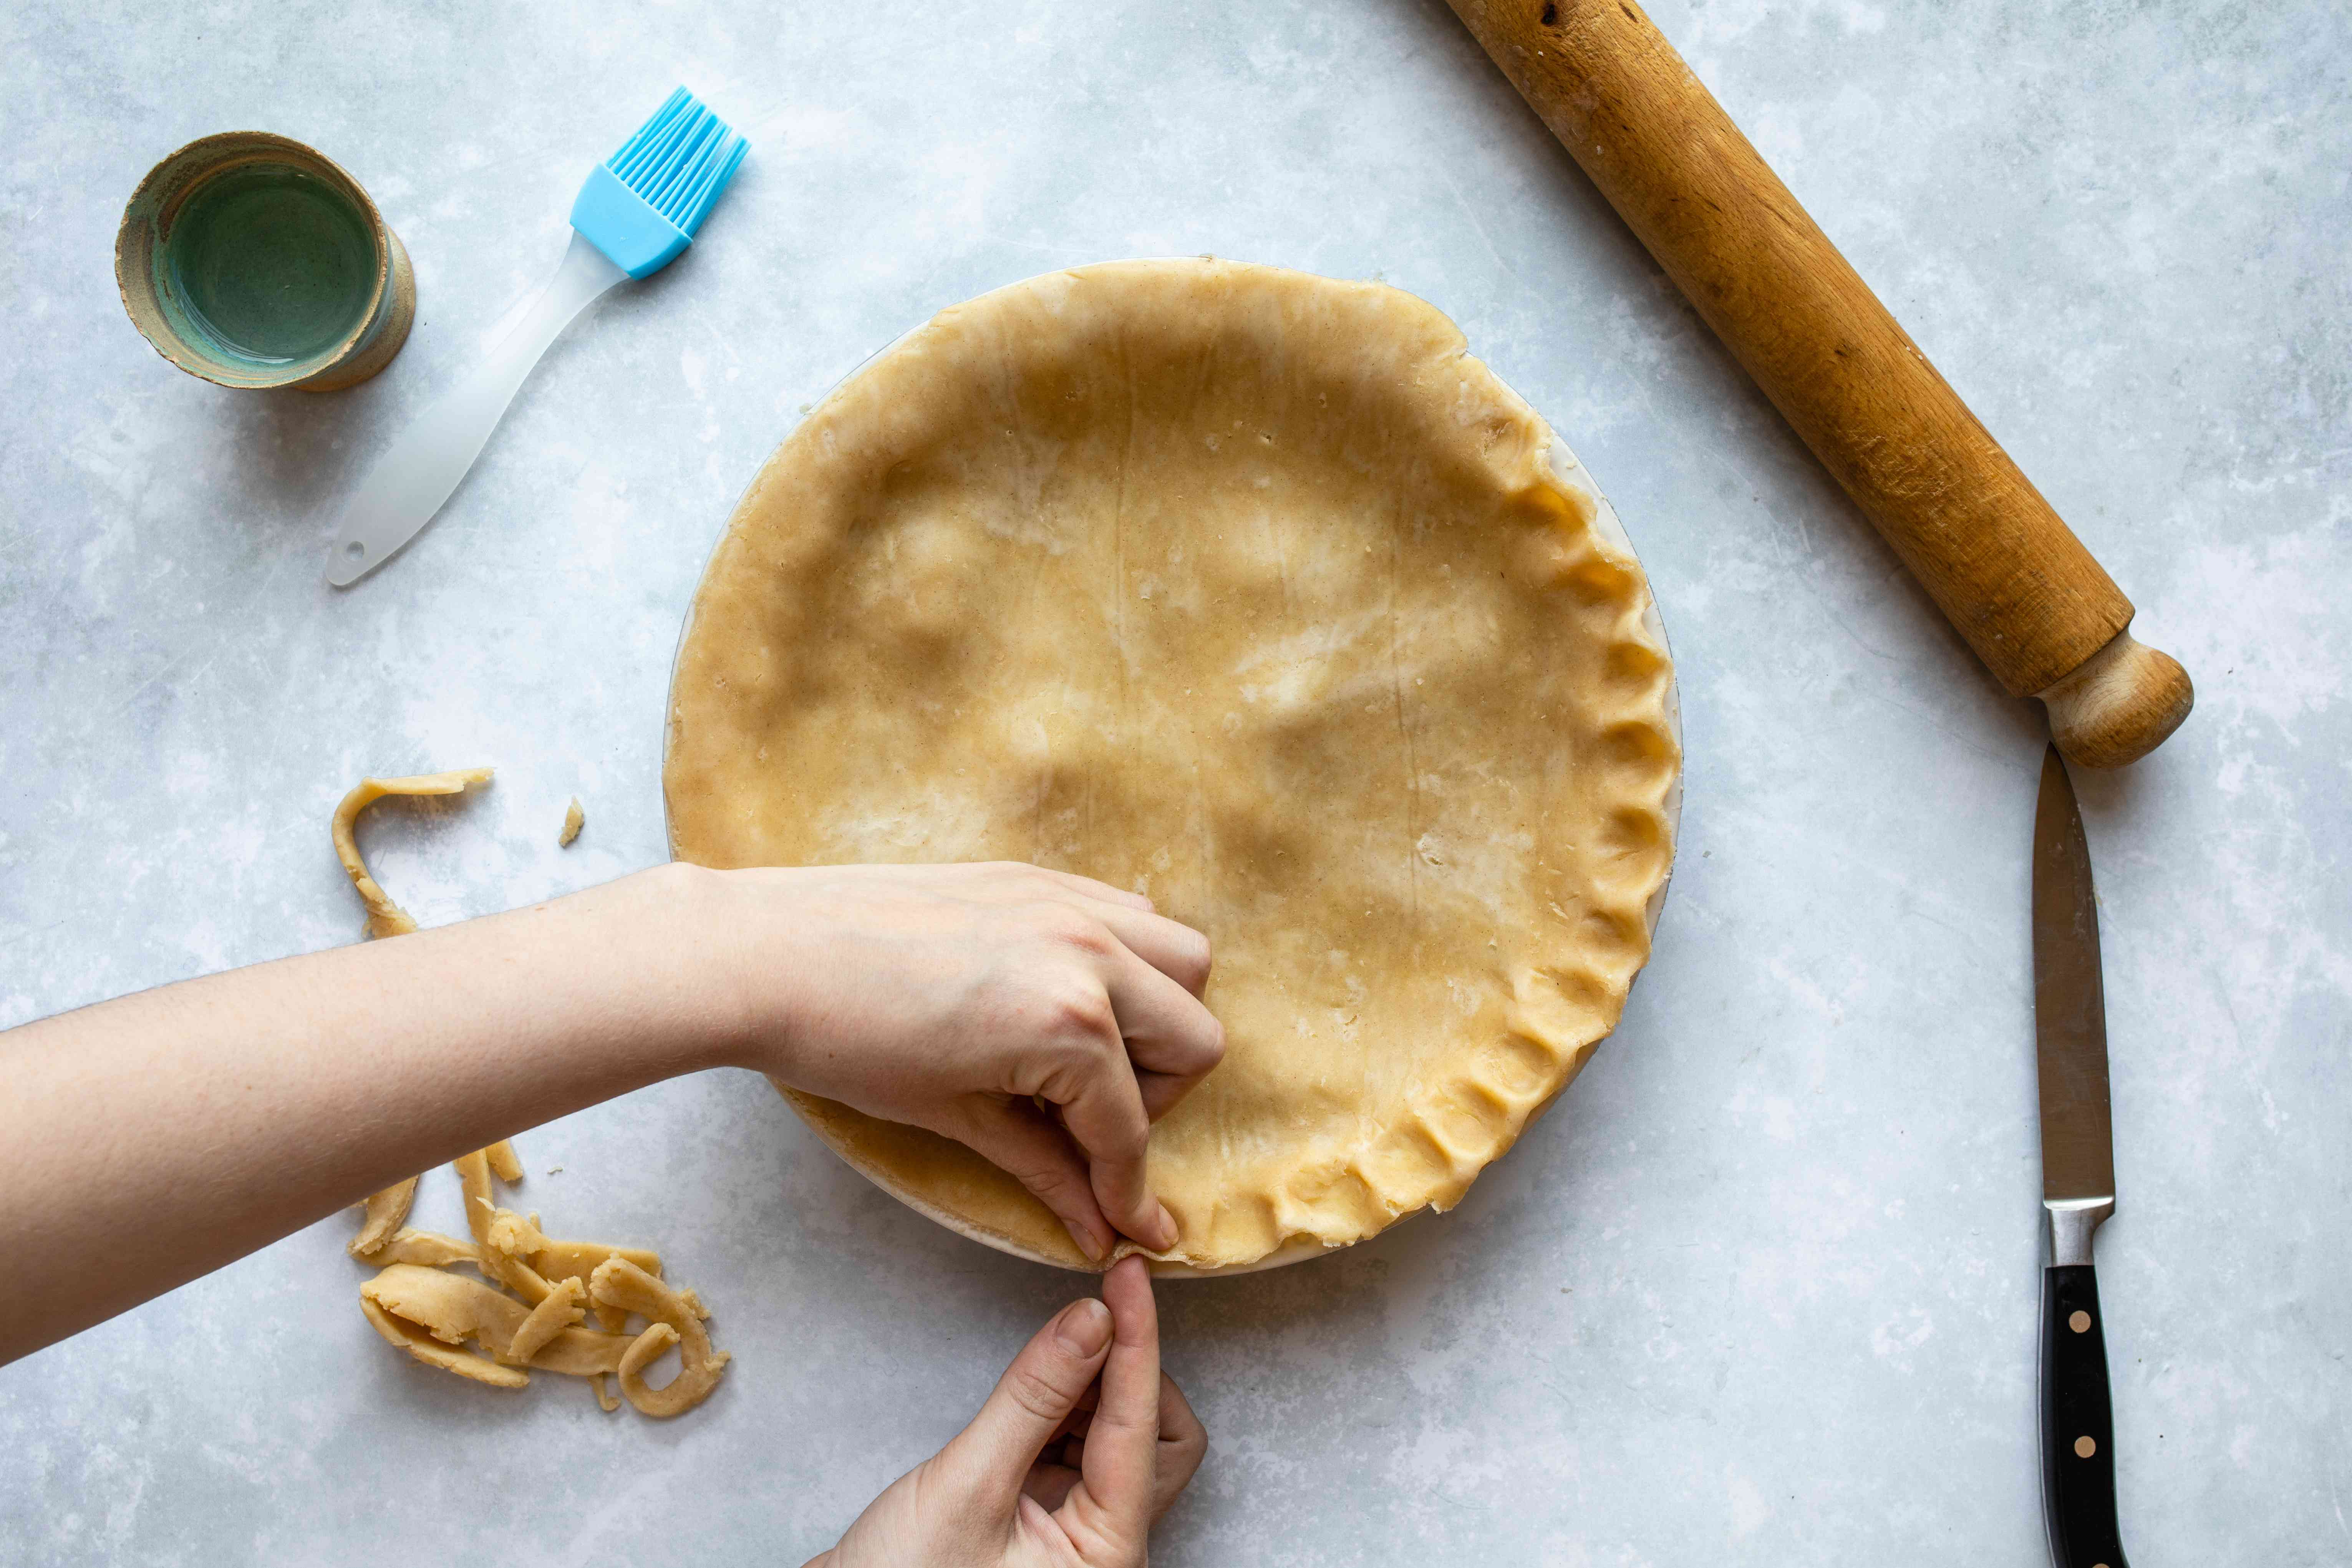 Crimping edges of dough